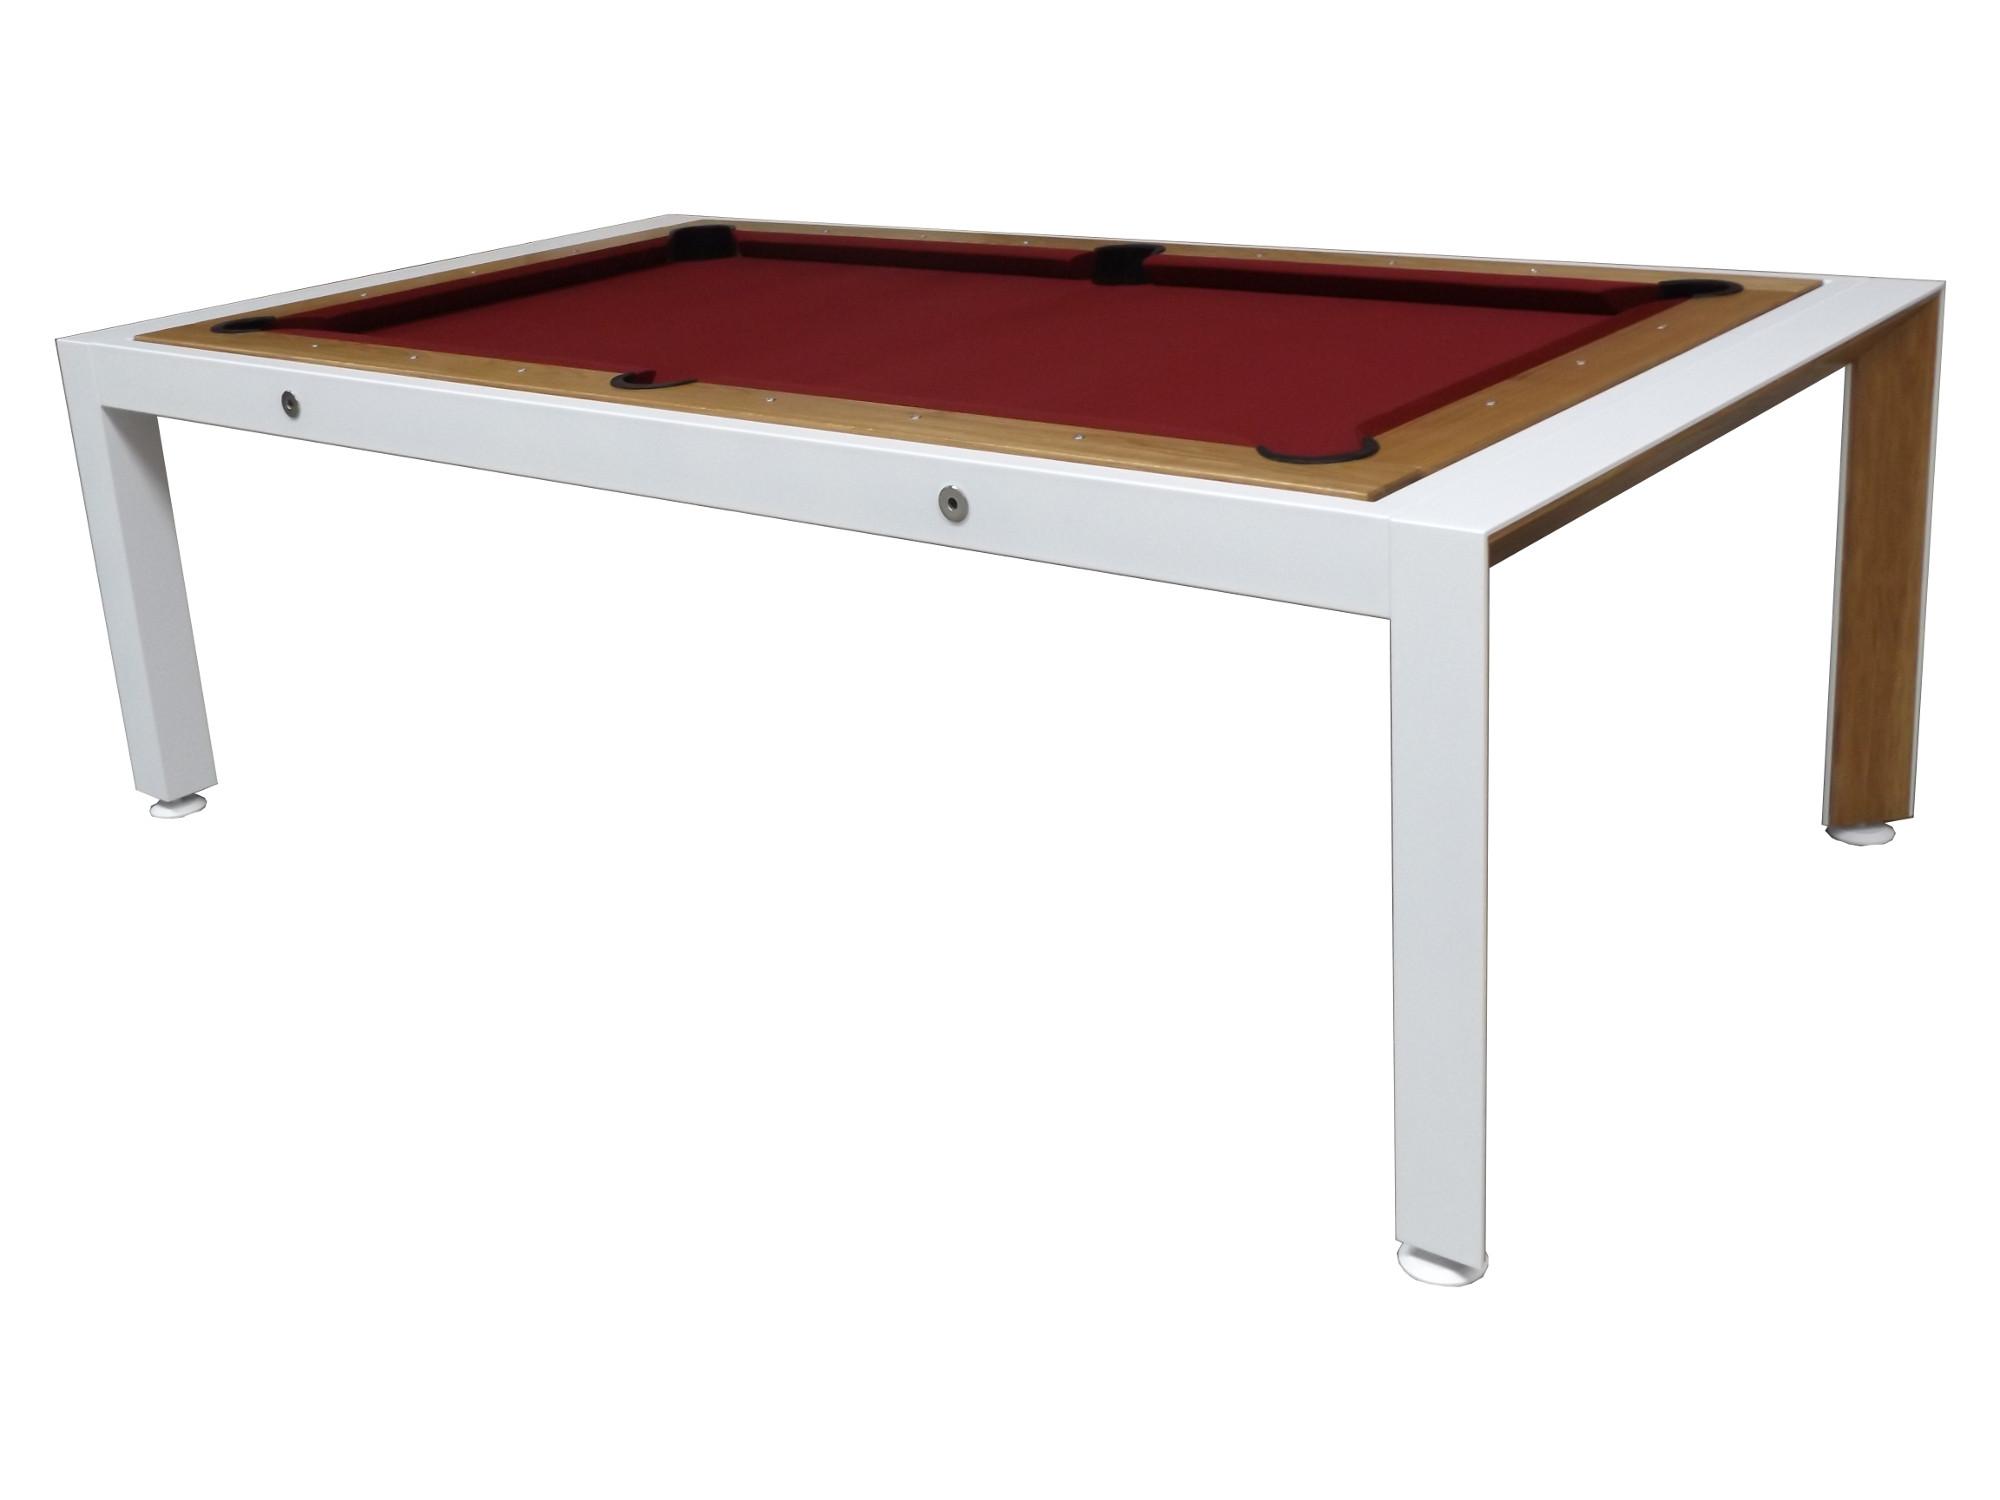 Billard table vienna 180 acheter en ligne billard lissy - Acheter billard table ...